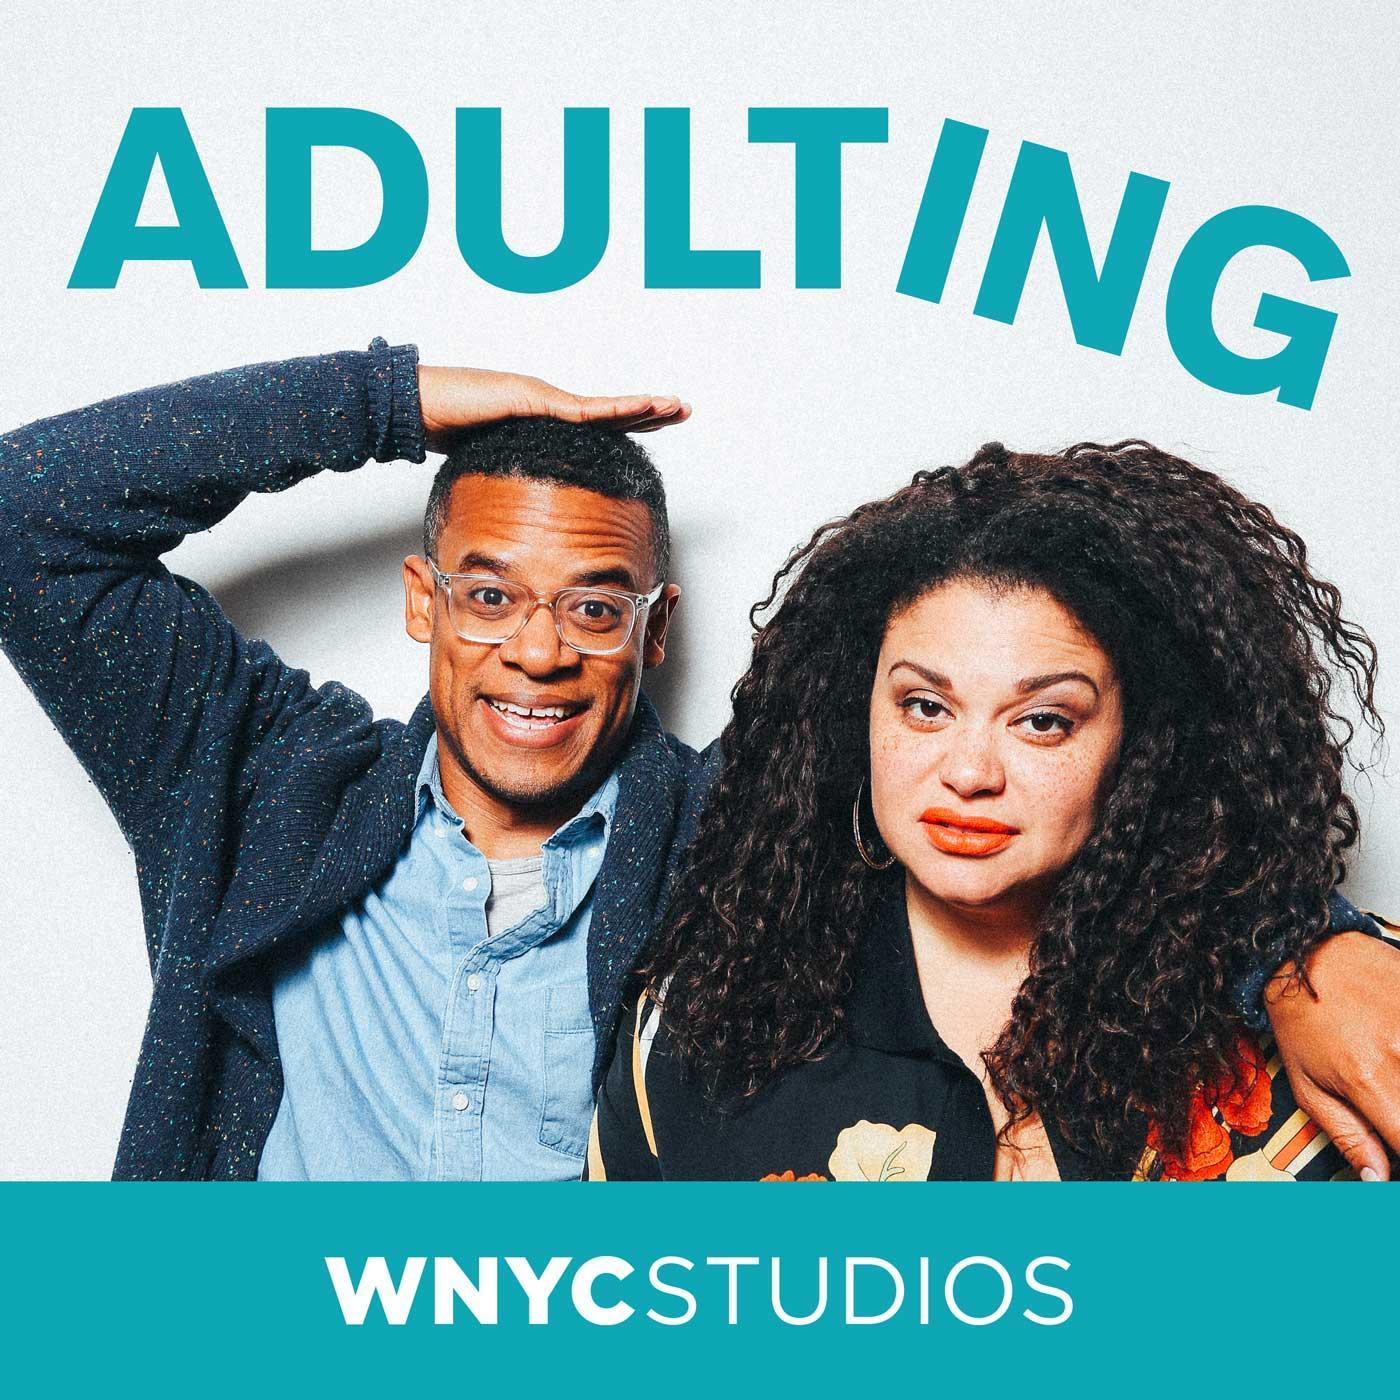 WNYC dating